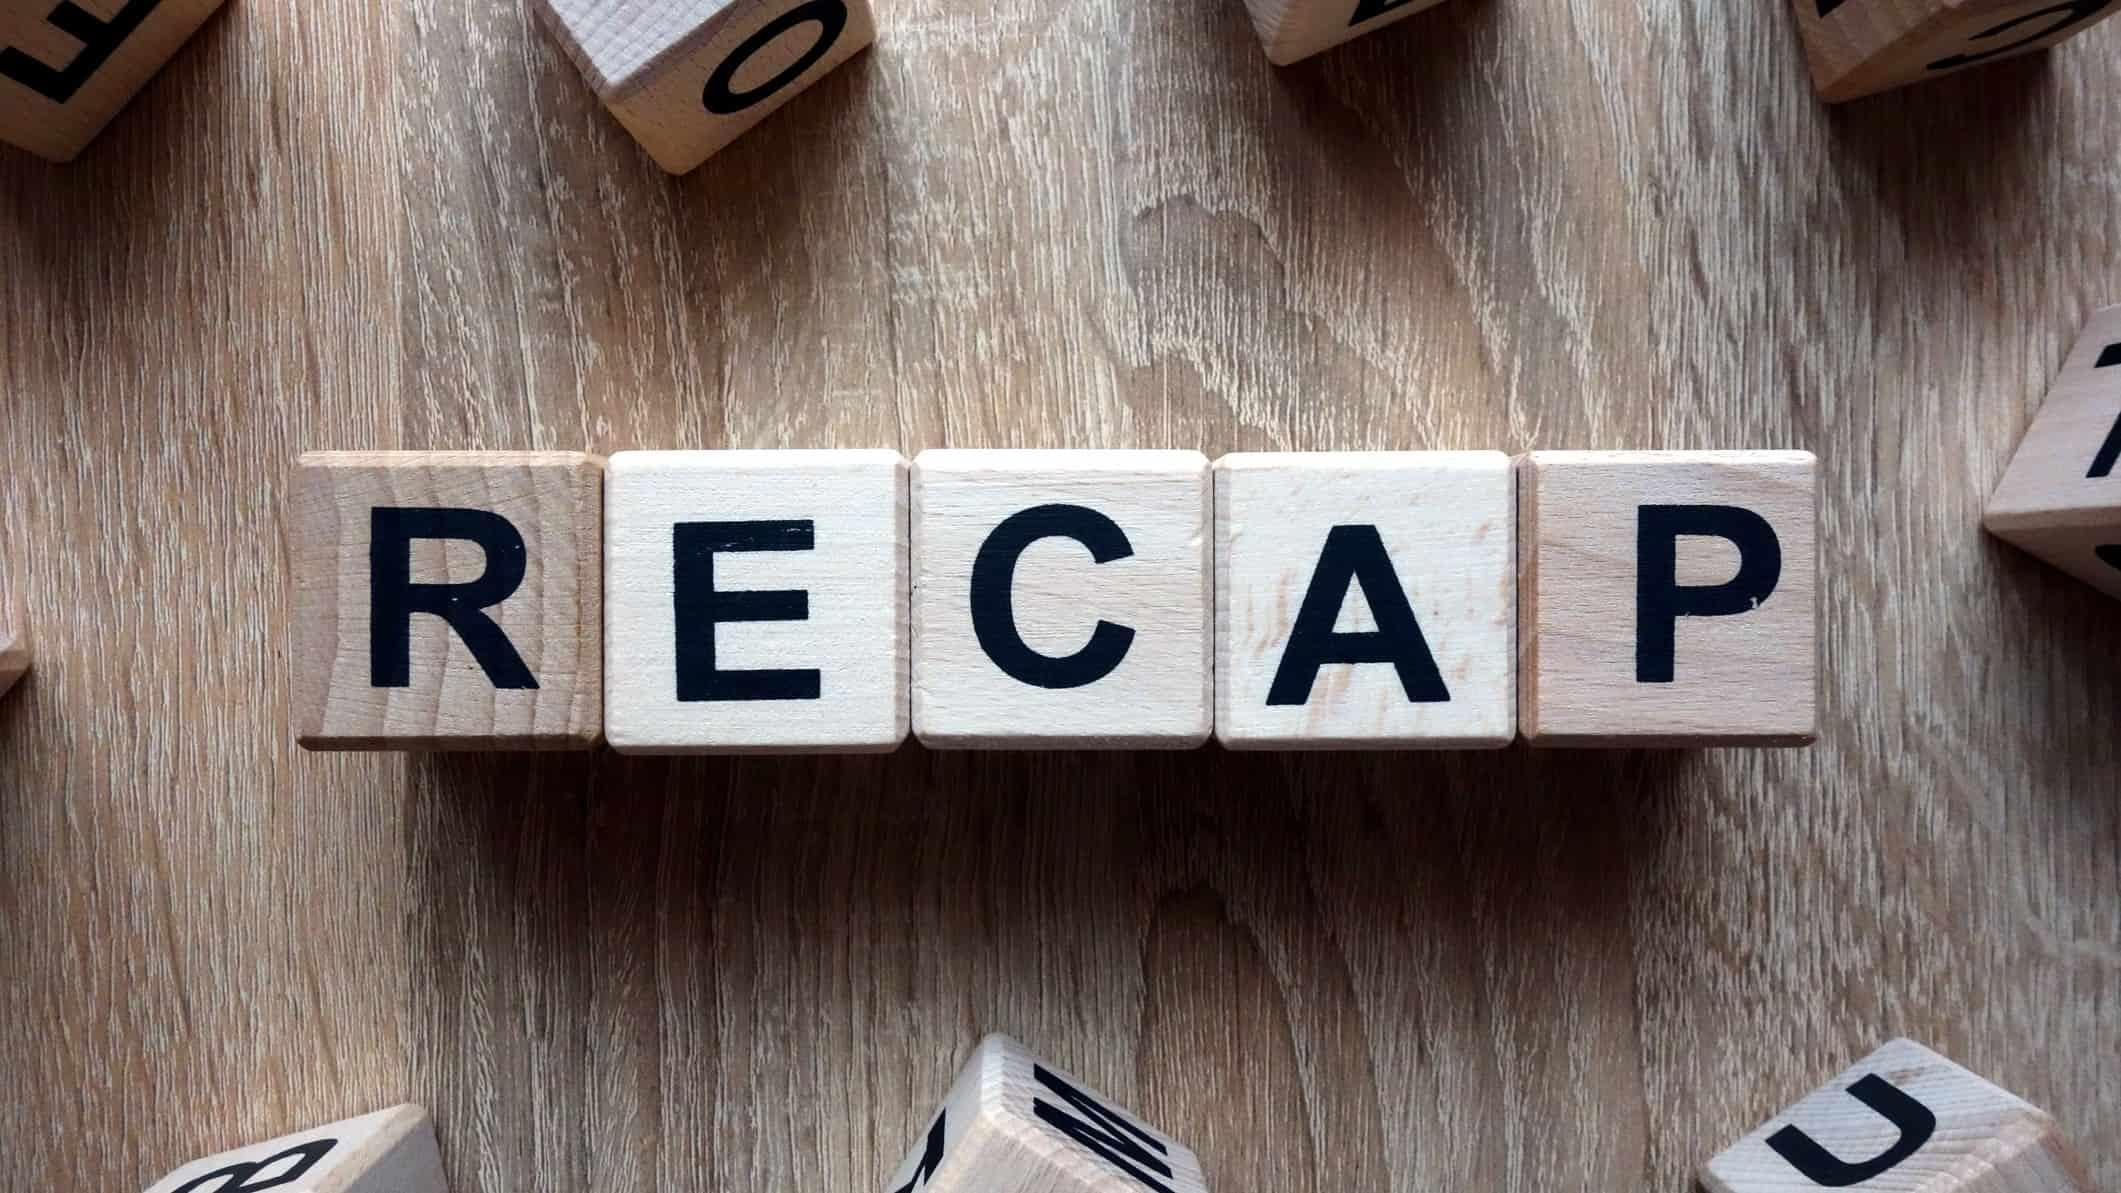 Wooden block letters spelling out 'recap', ASX 200